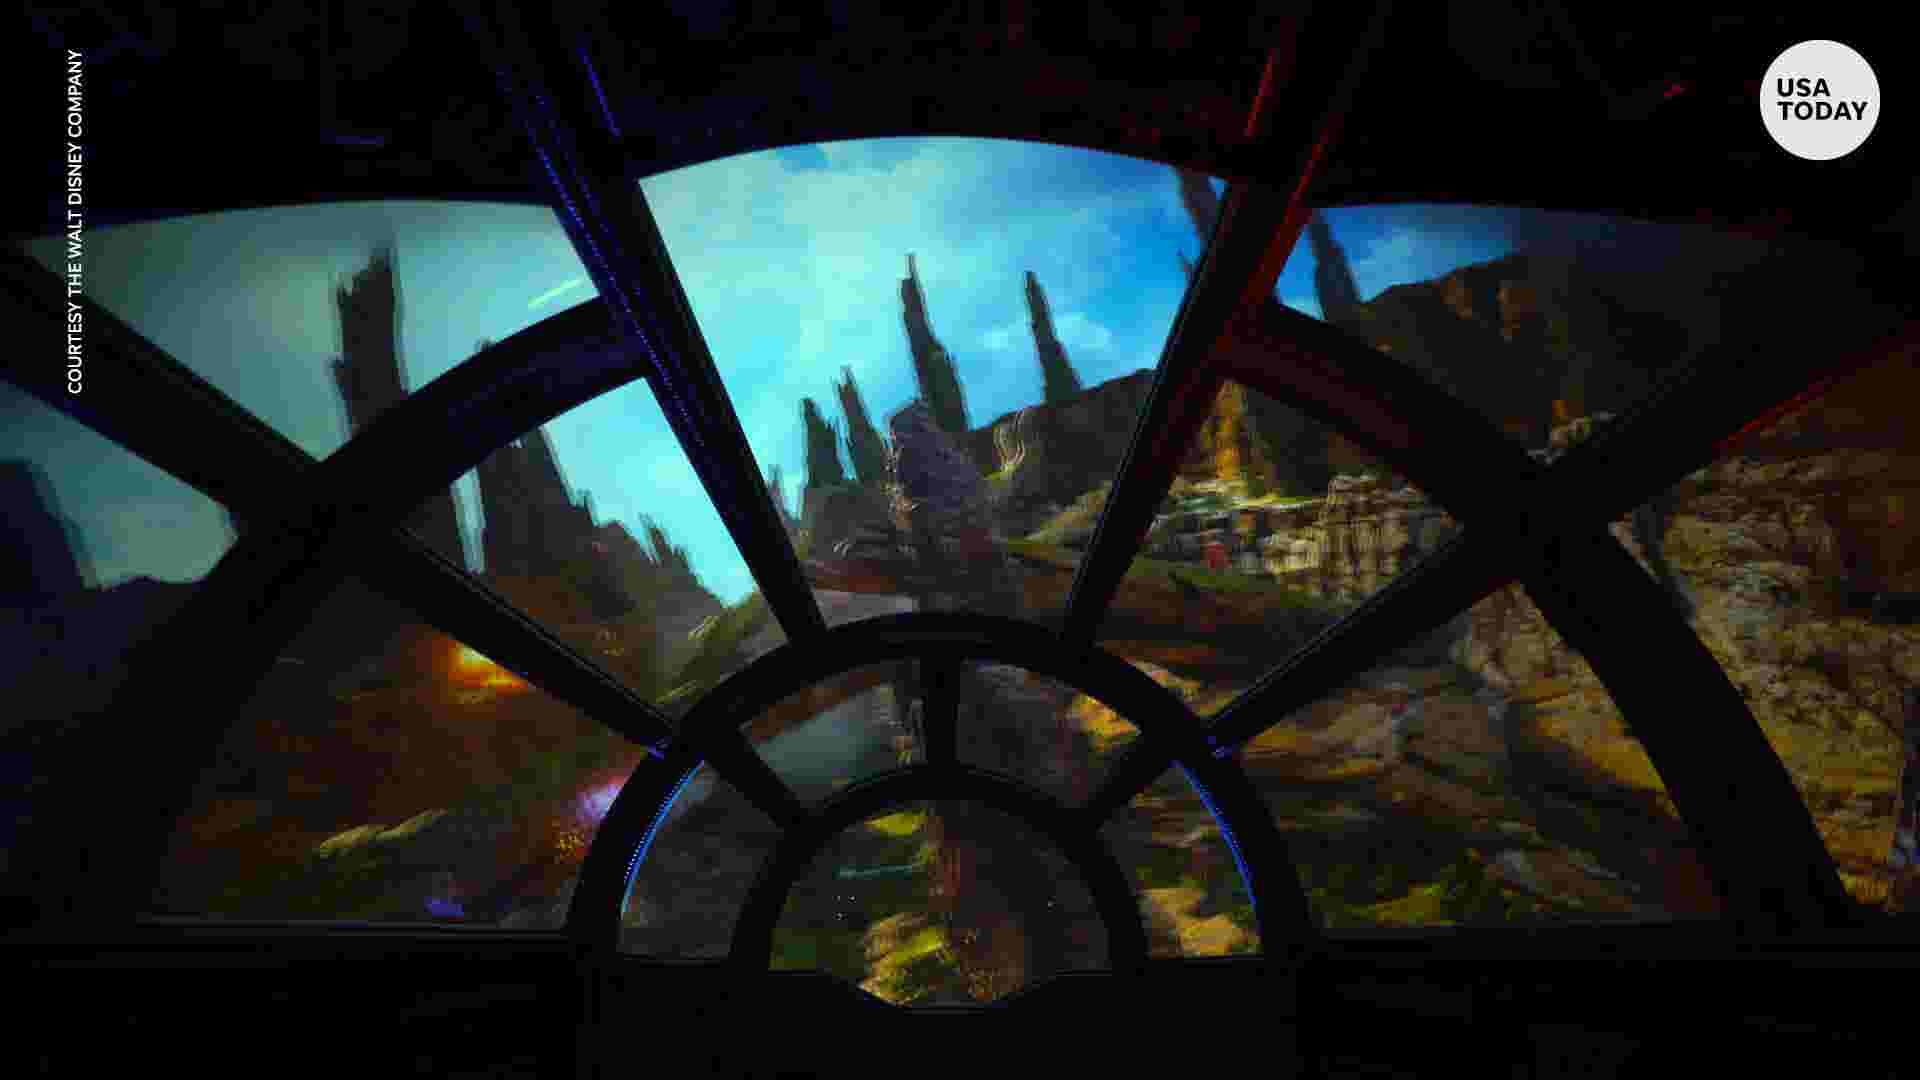 a5c6b849 Take a look inside the Millennium Falcon ride at Star Wars: Galaxy's Edge  at Disneyland